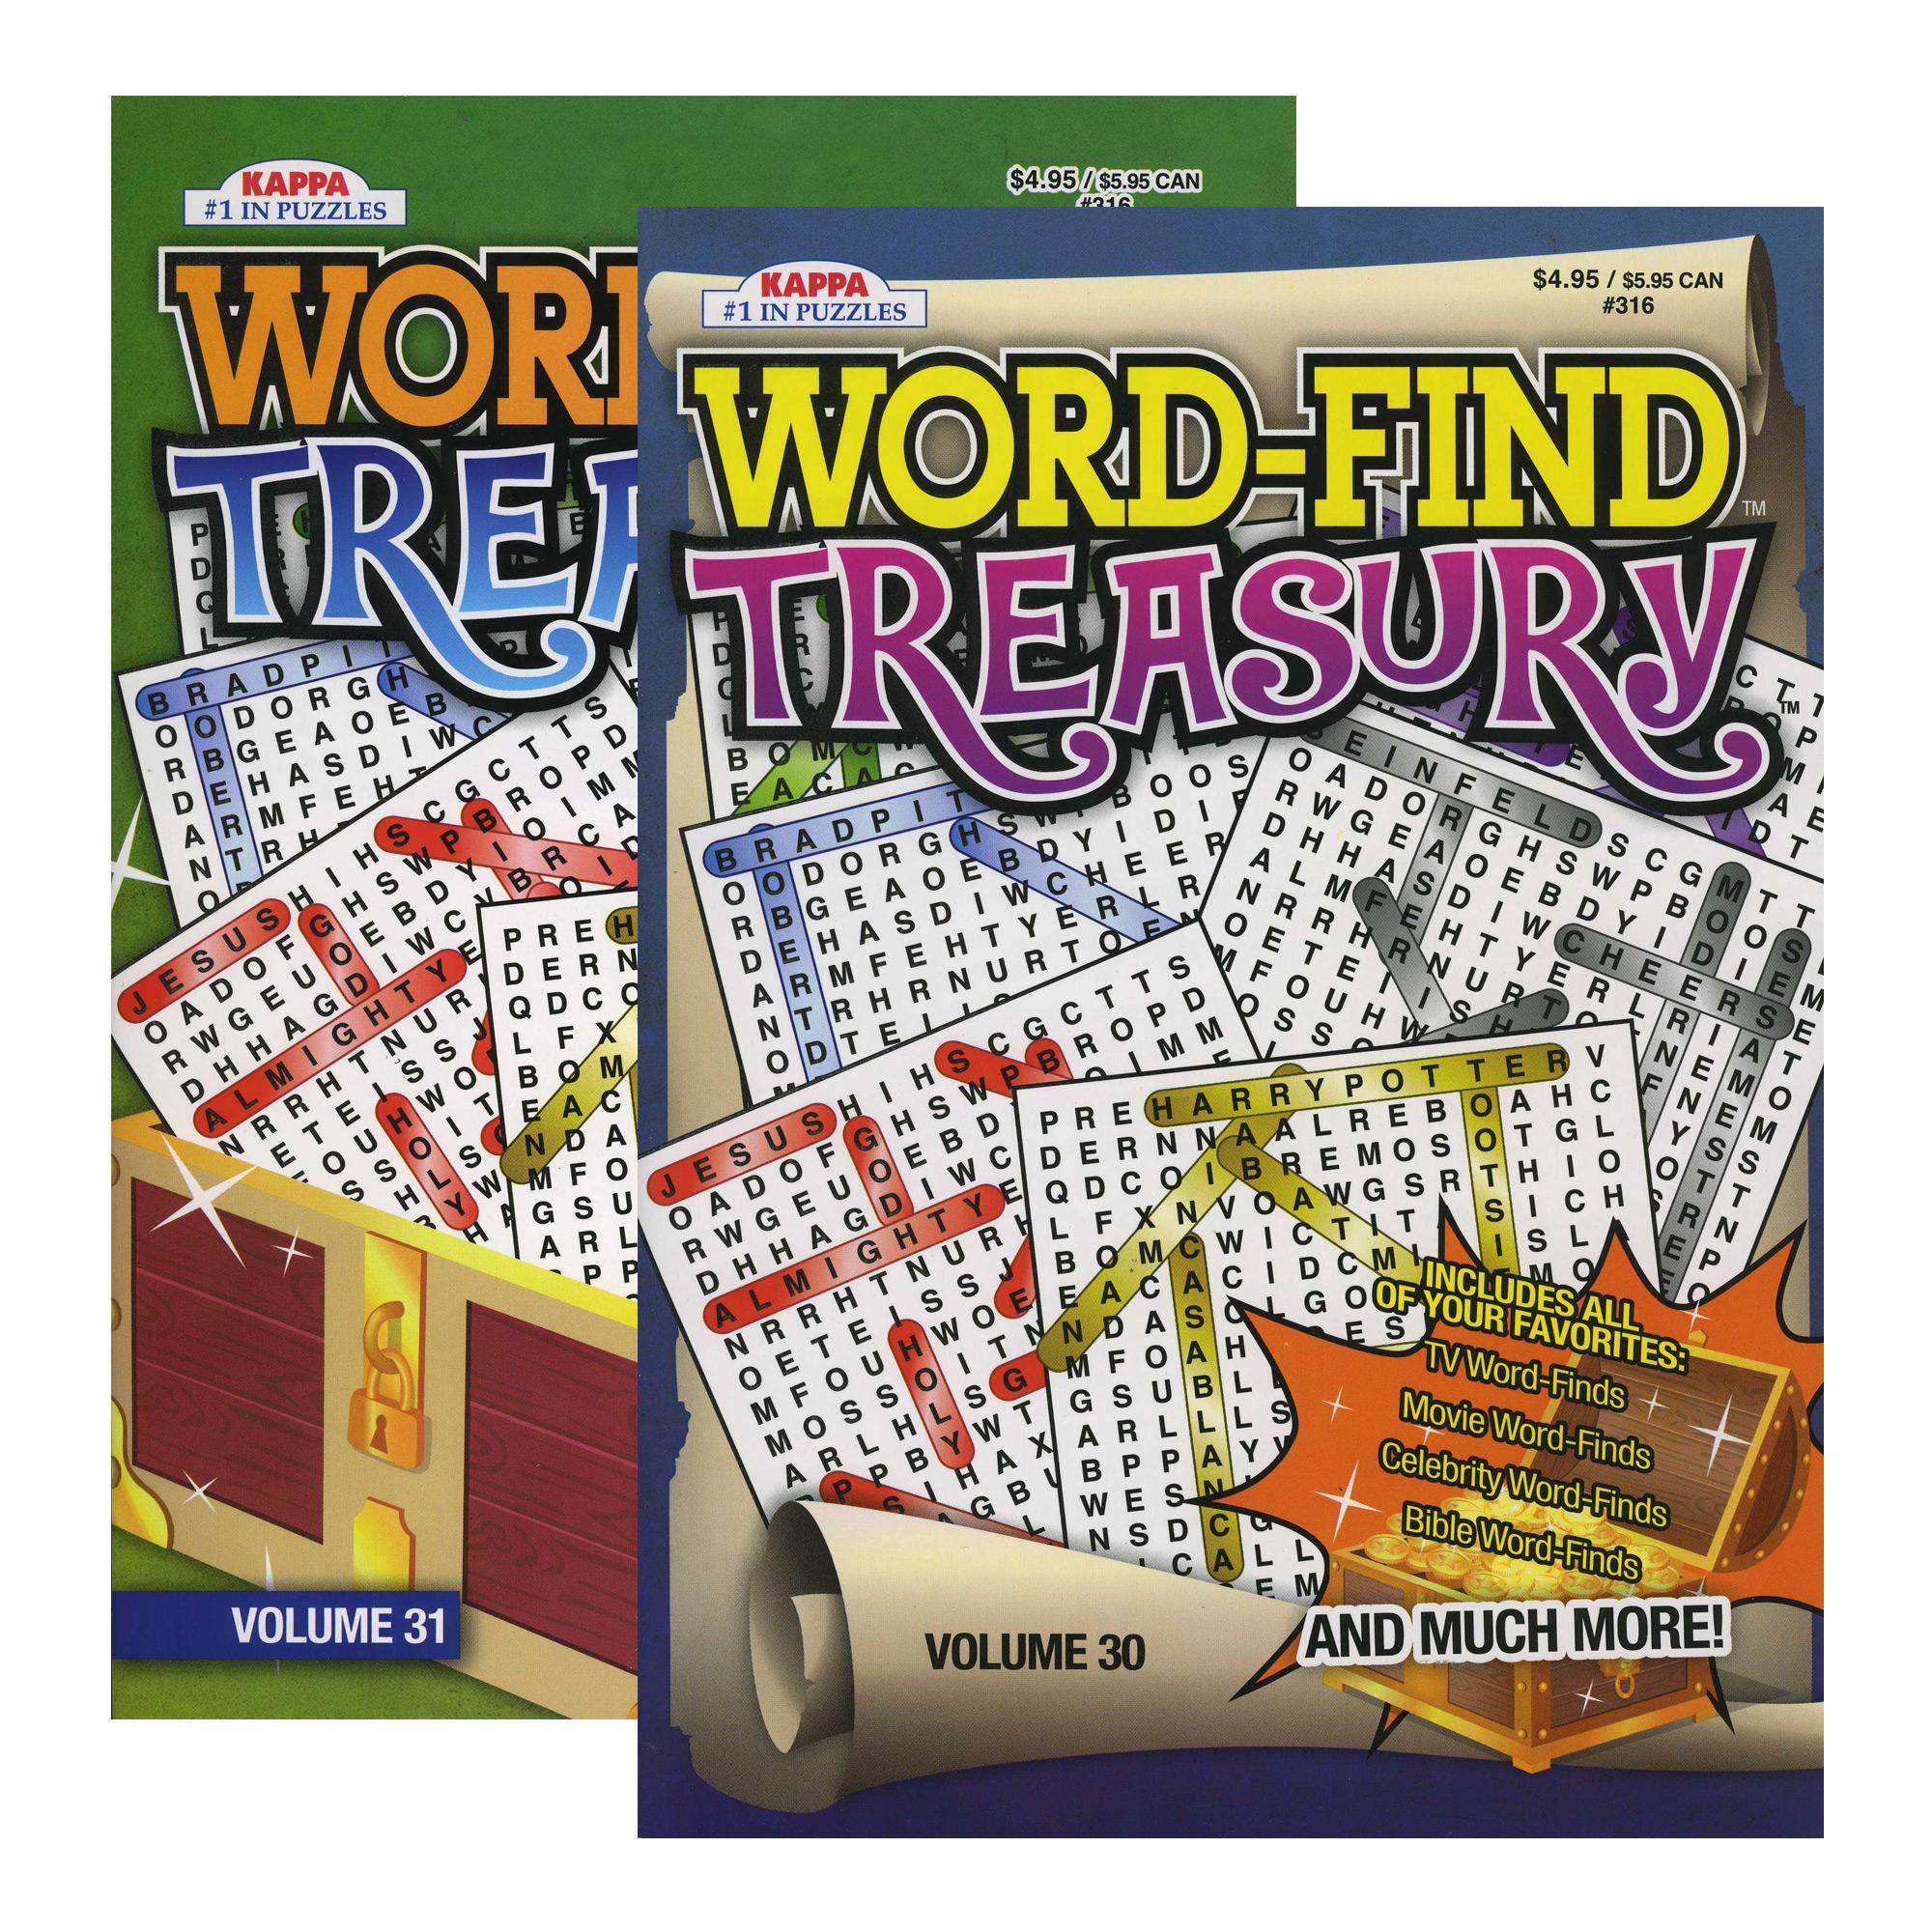 Puzzles KAPPA Word-Find Treasury